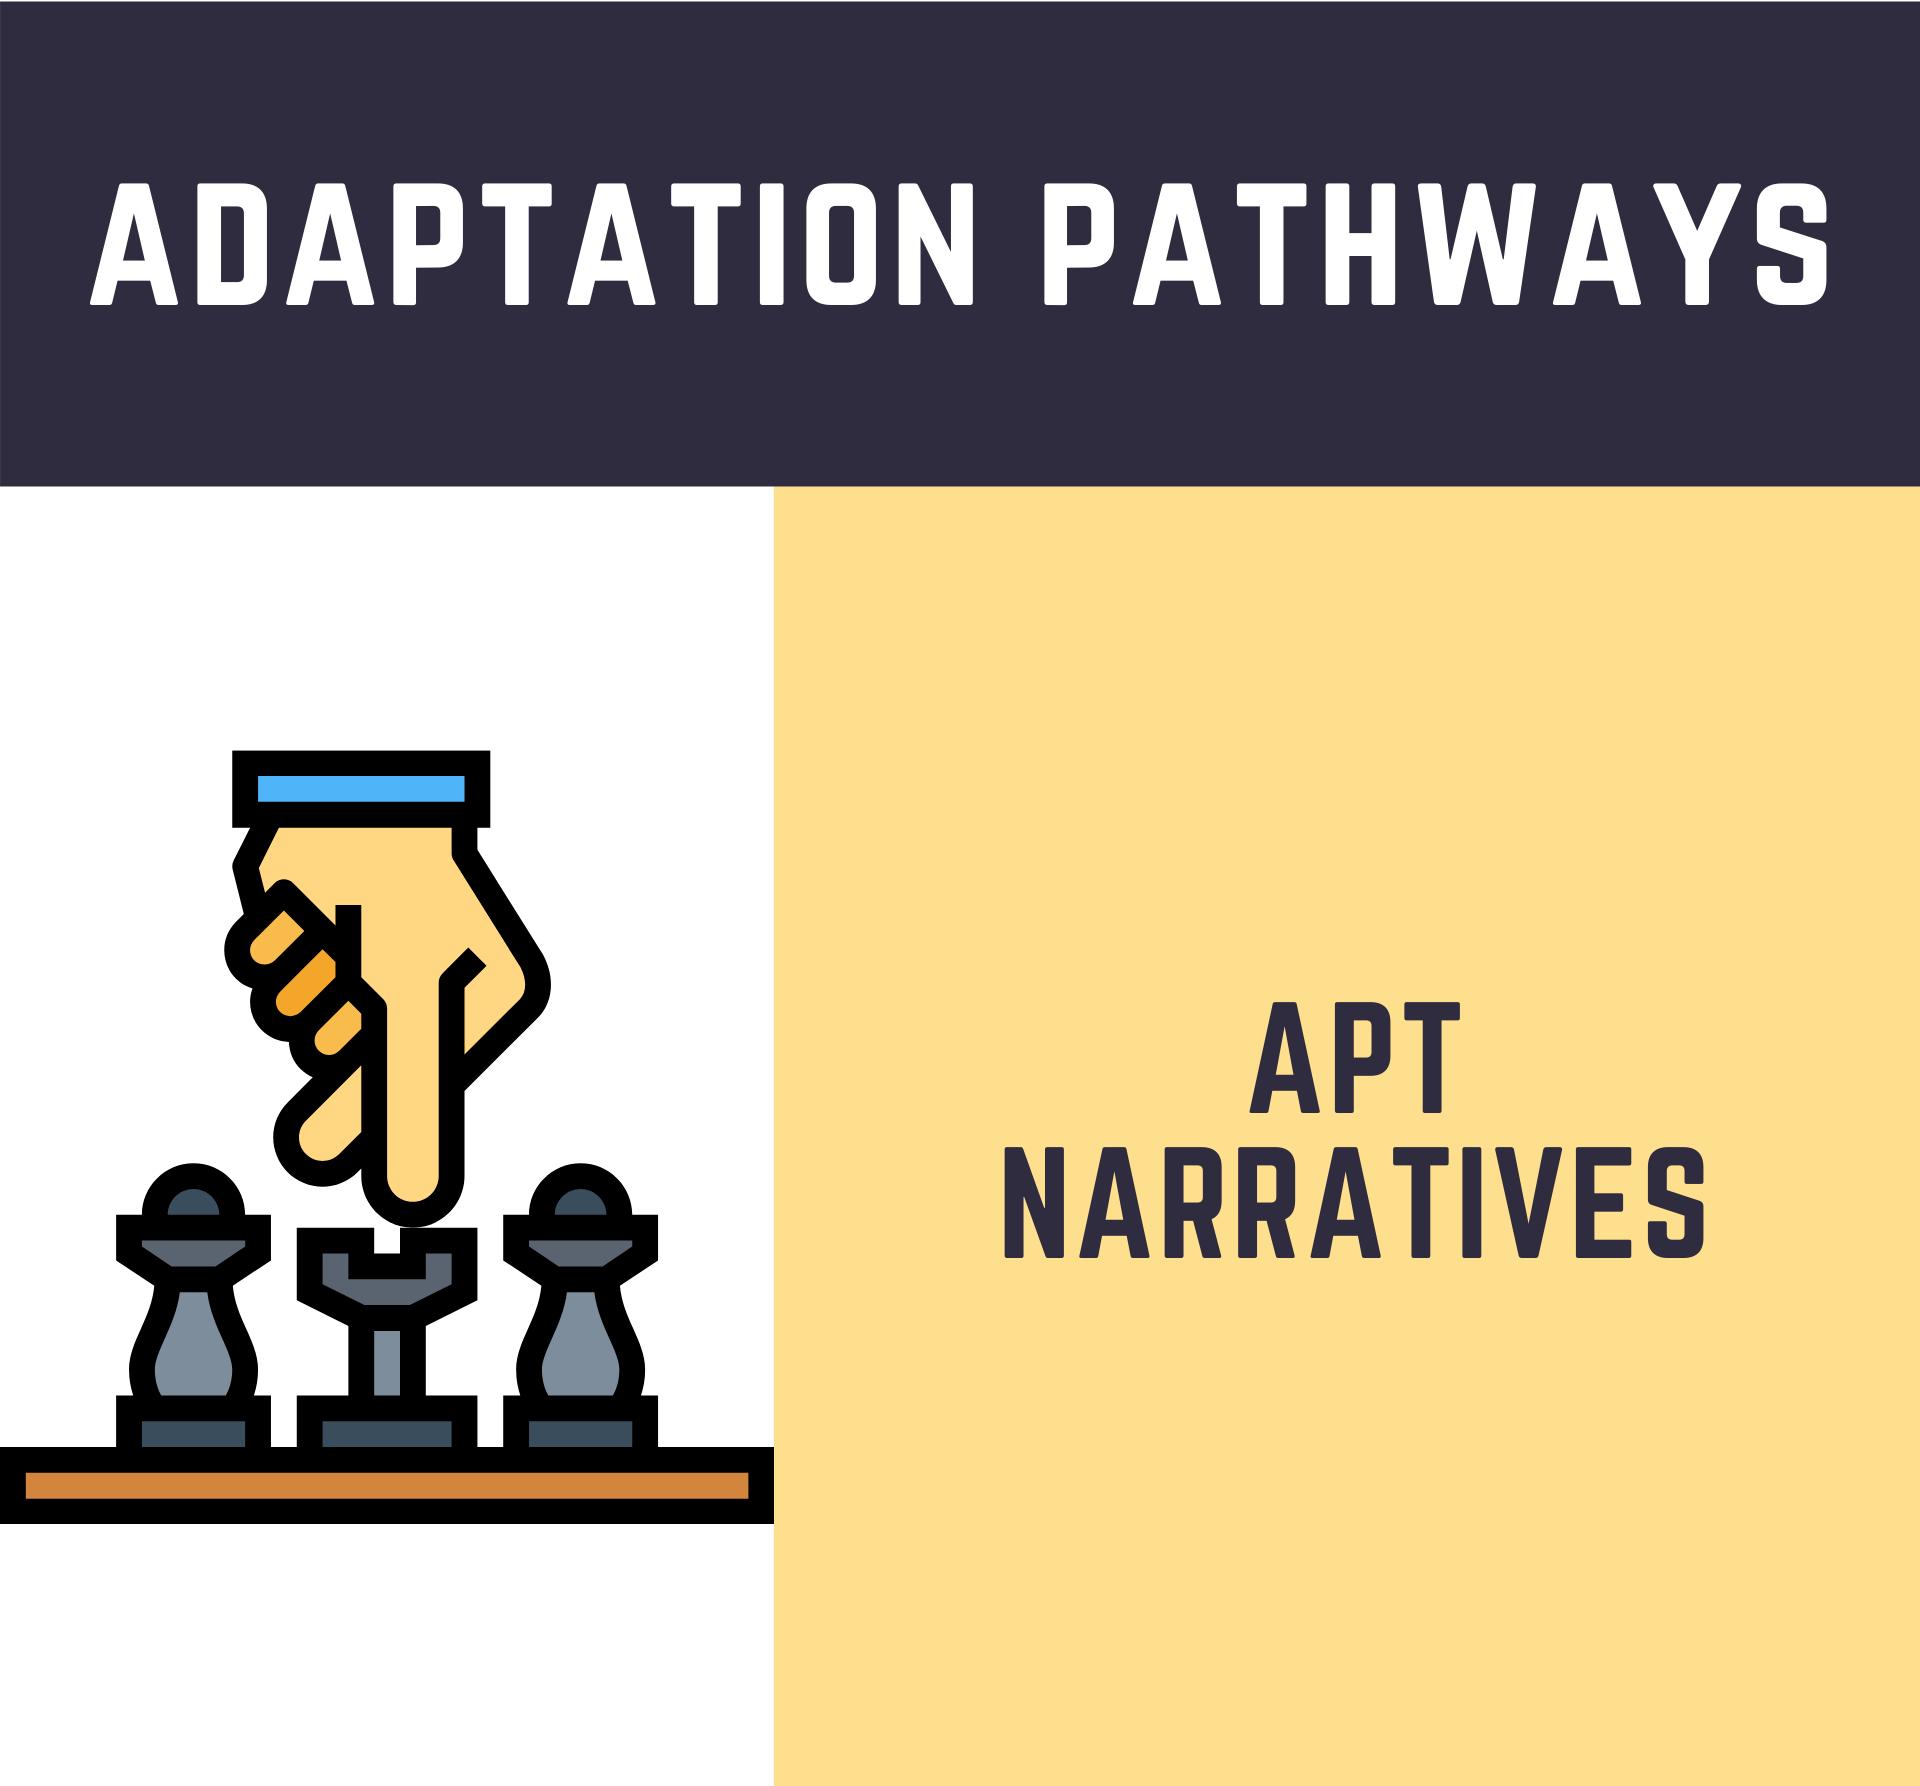 ADAPTATION PATHWAYS NARRATIVES